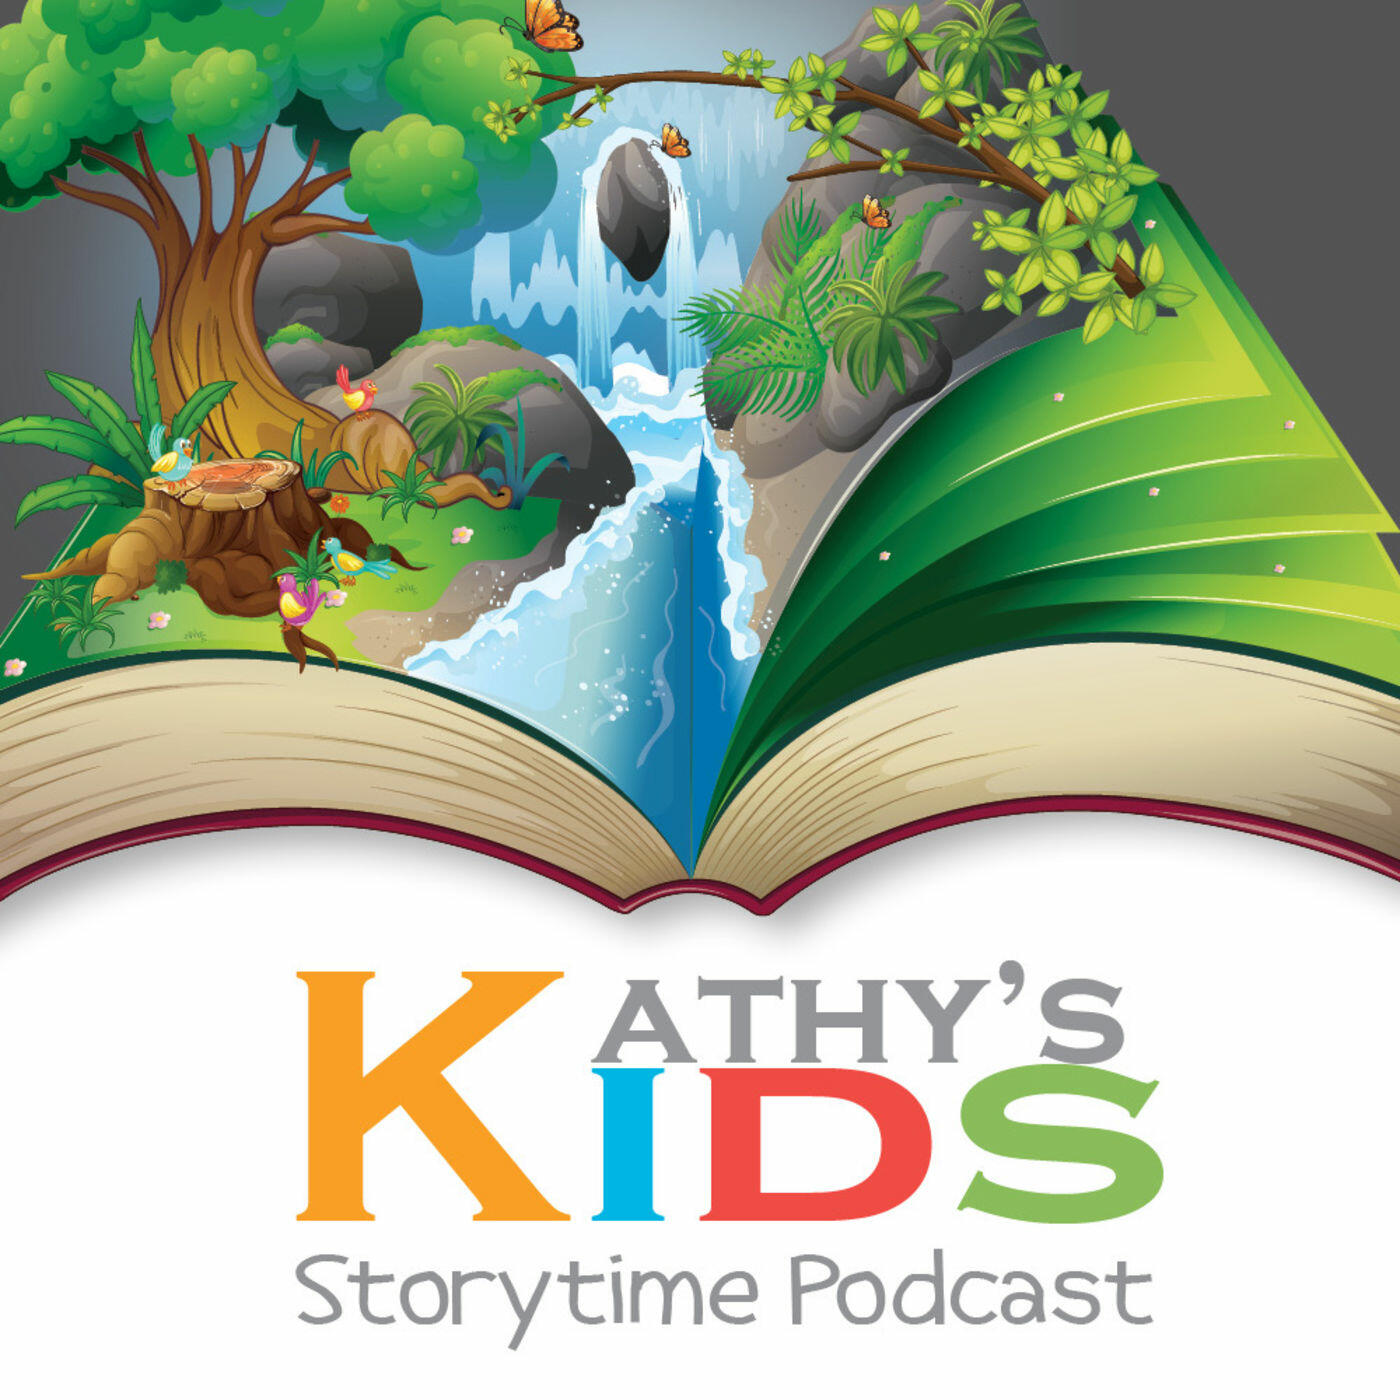 Kathy's Kids Storytime